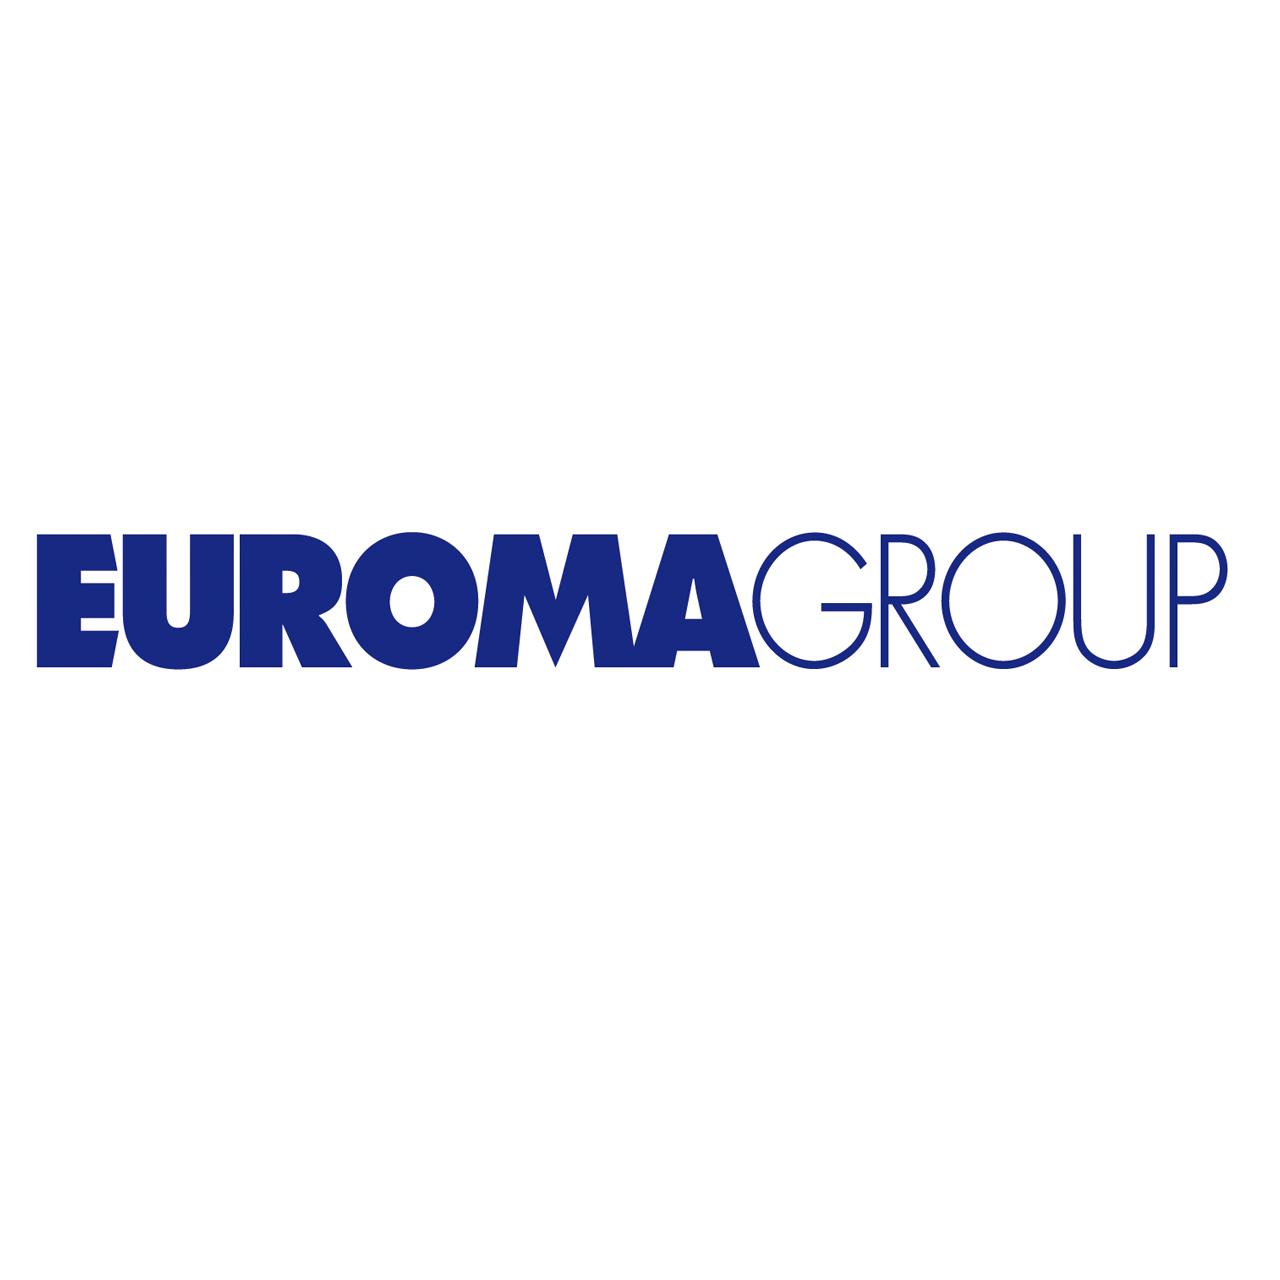 Euroma Group logo